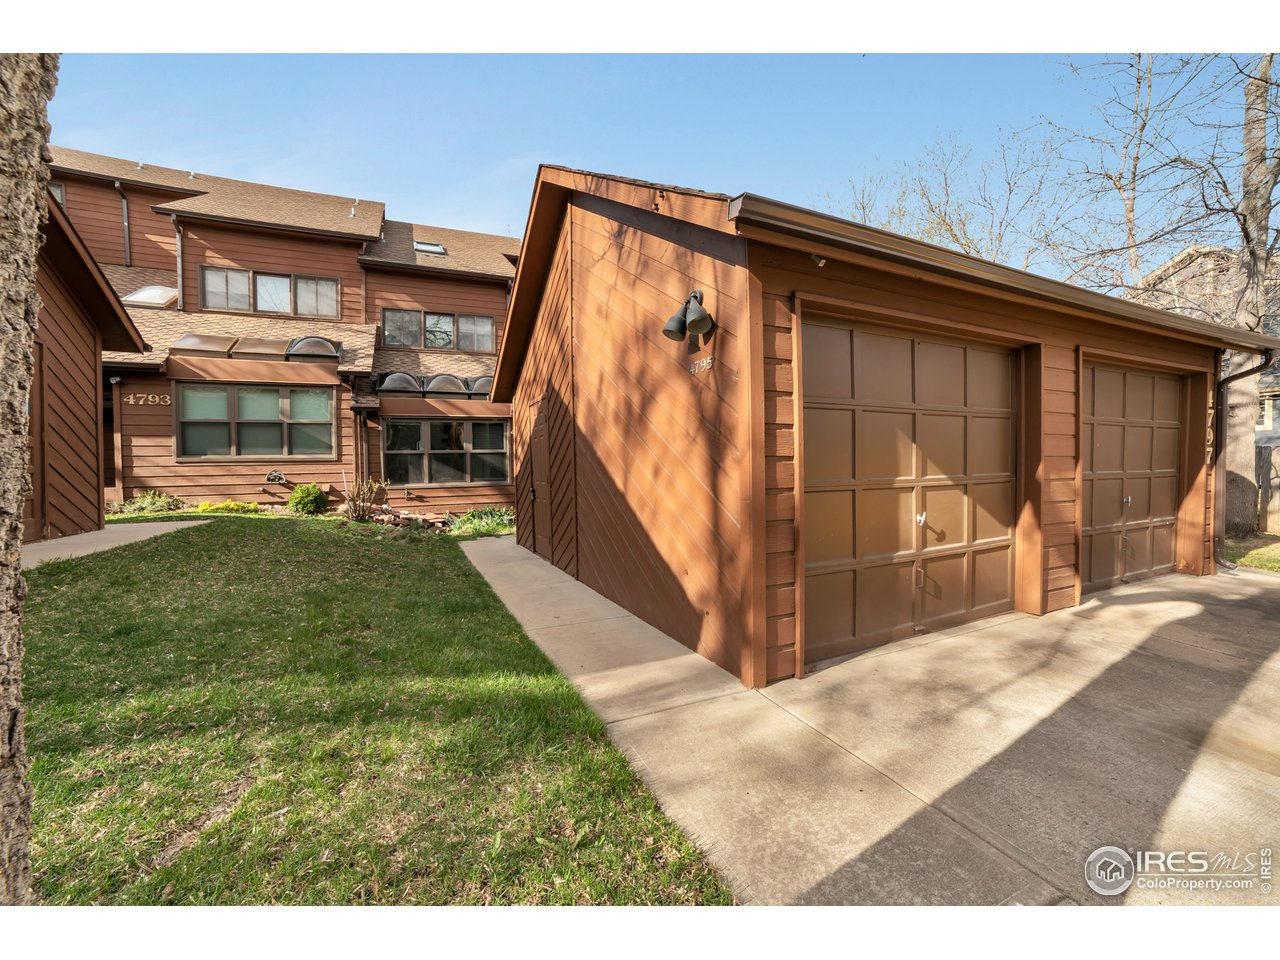 4795 Edison Ave, Boulder CO 80301